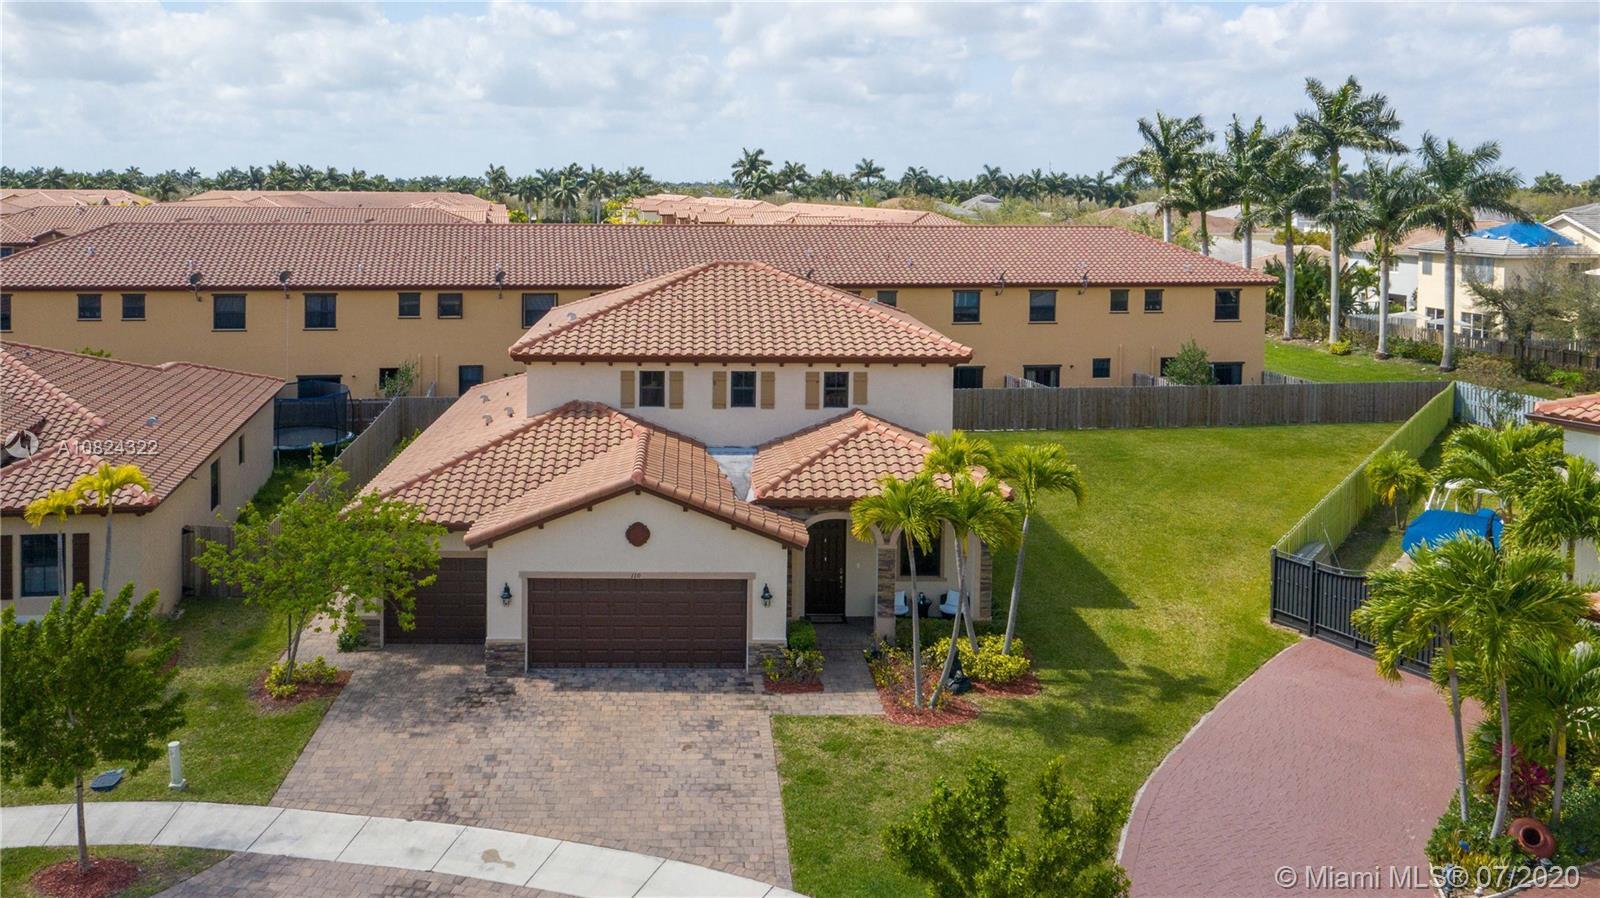 110 SE 34th Pl, Homestead, FL 33033